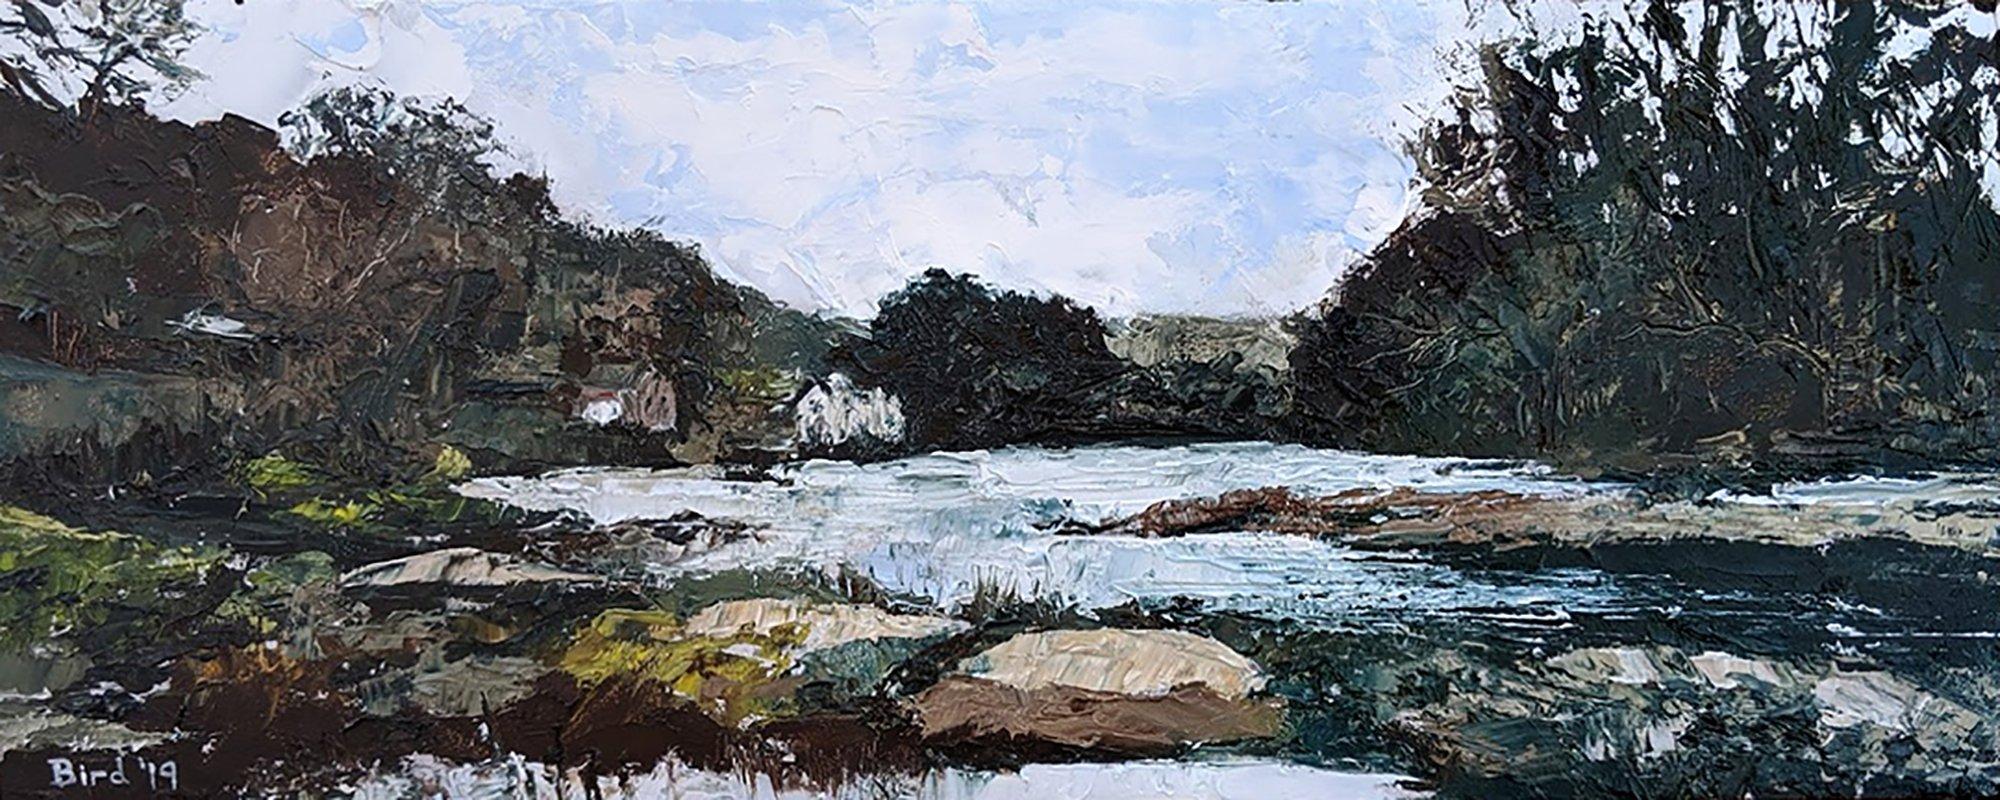 "The River Dee at Llangollen - Upstream - Oil on board 15""x6"" £200"